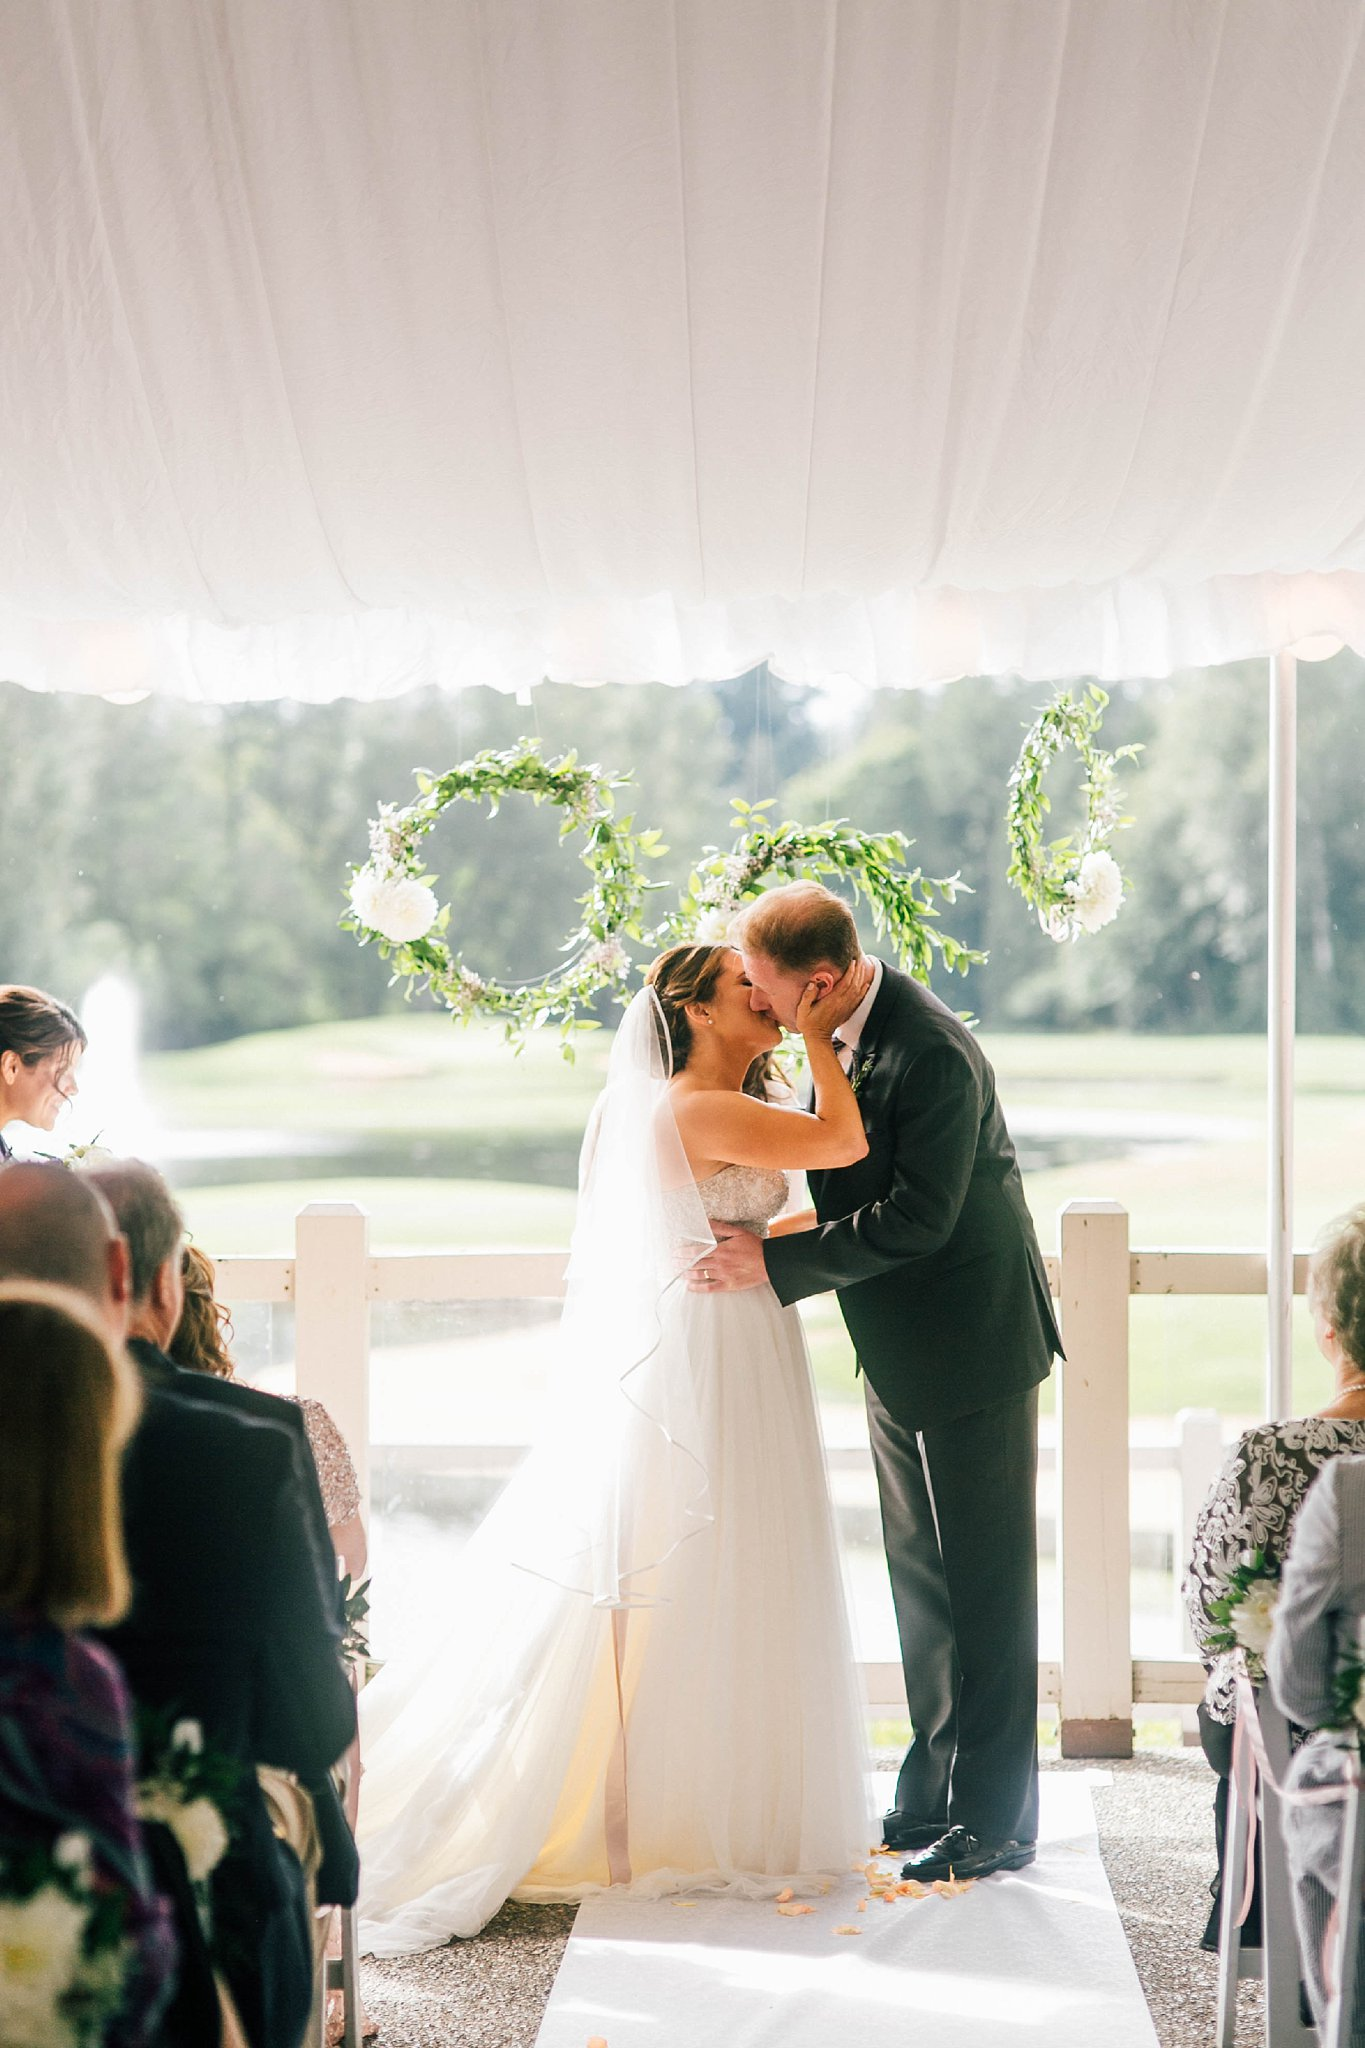 ashley_vos_seattle_wedding_photographer_0098.jpg